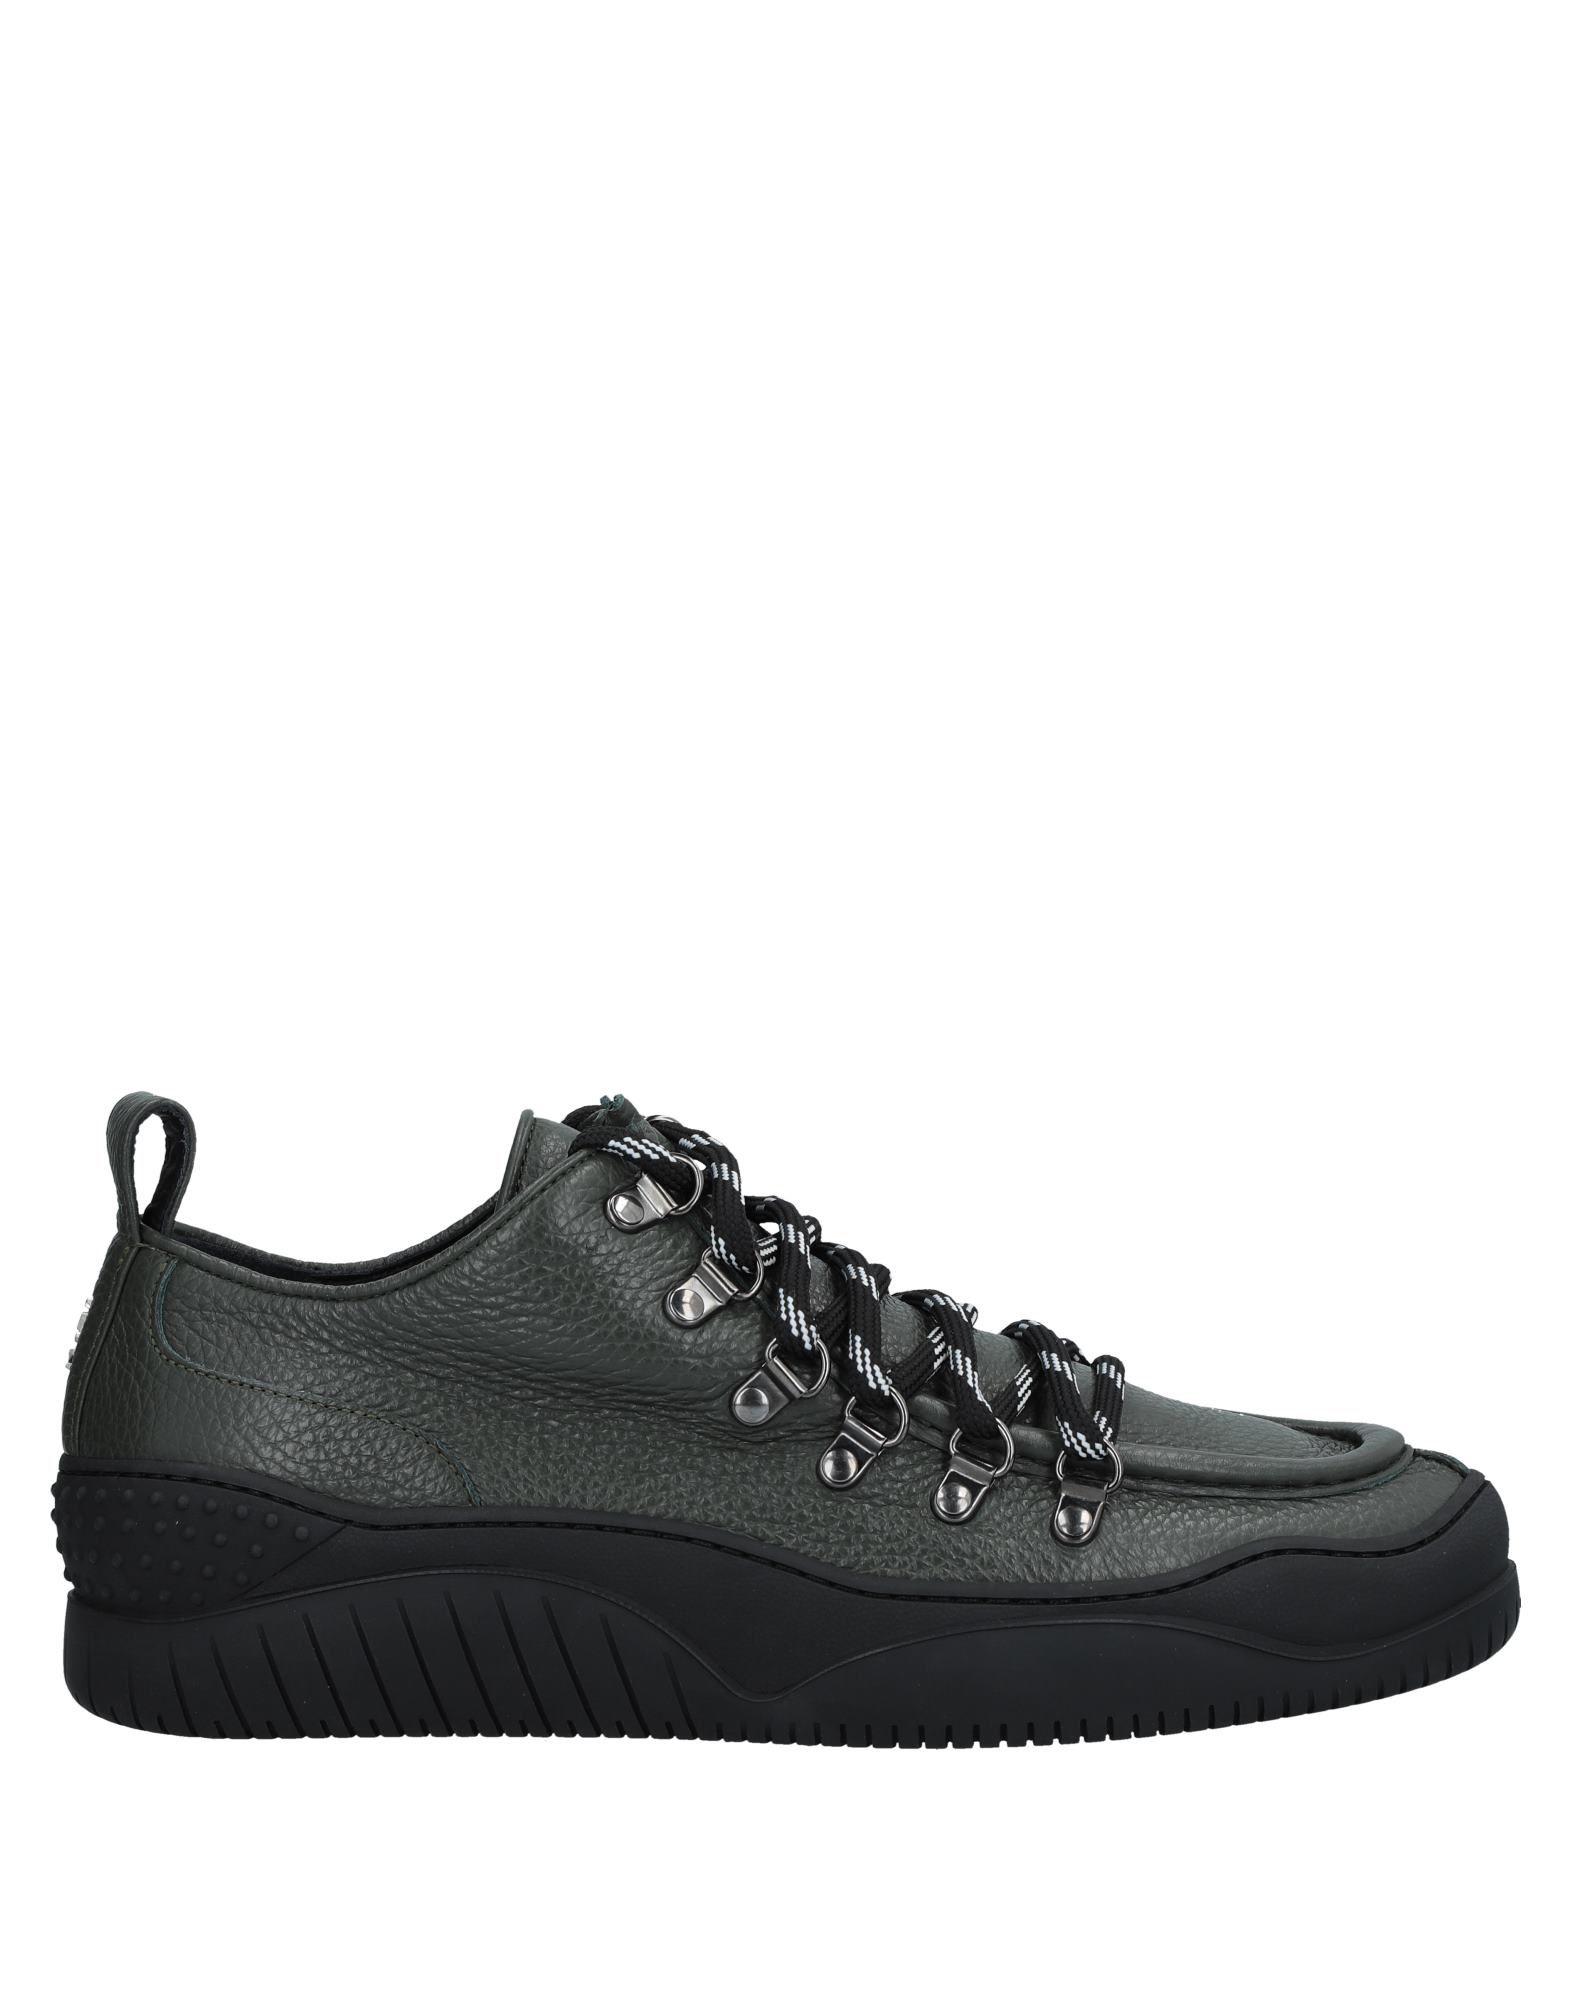 N° 21 Sneakers Herren  11533274KJ Gute Qualität beliebte Schuhe